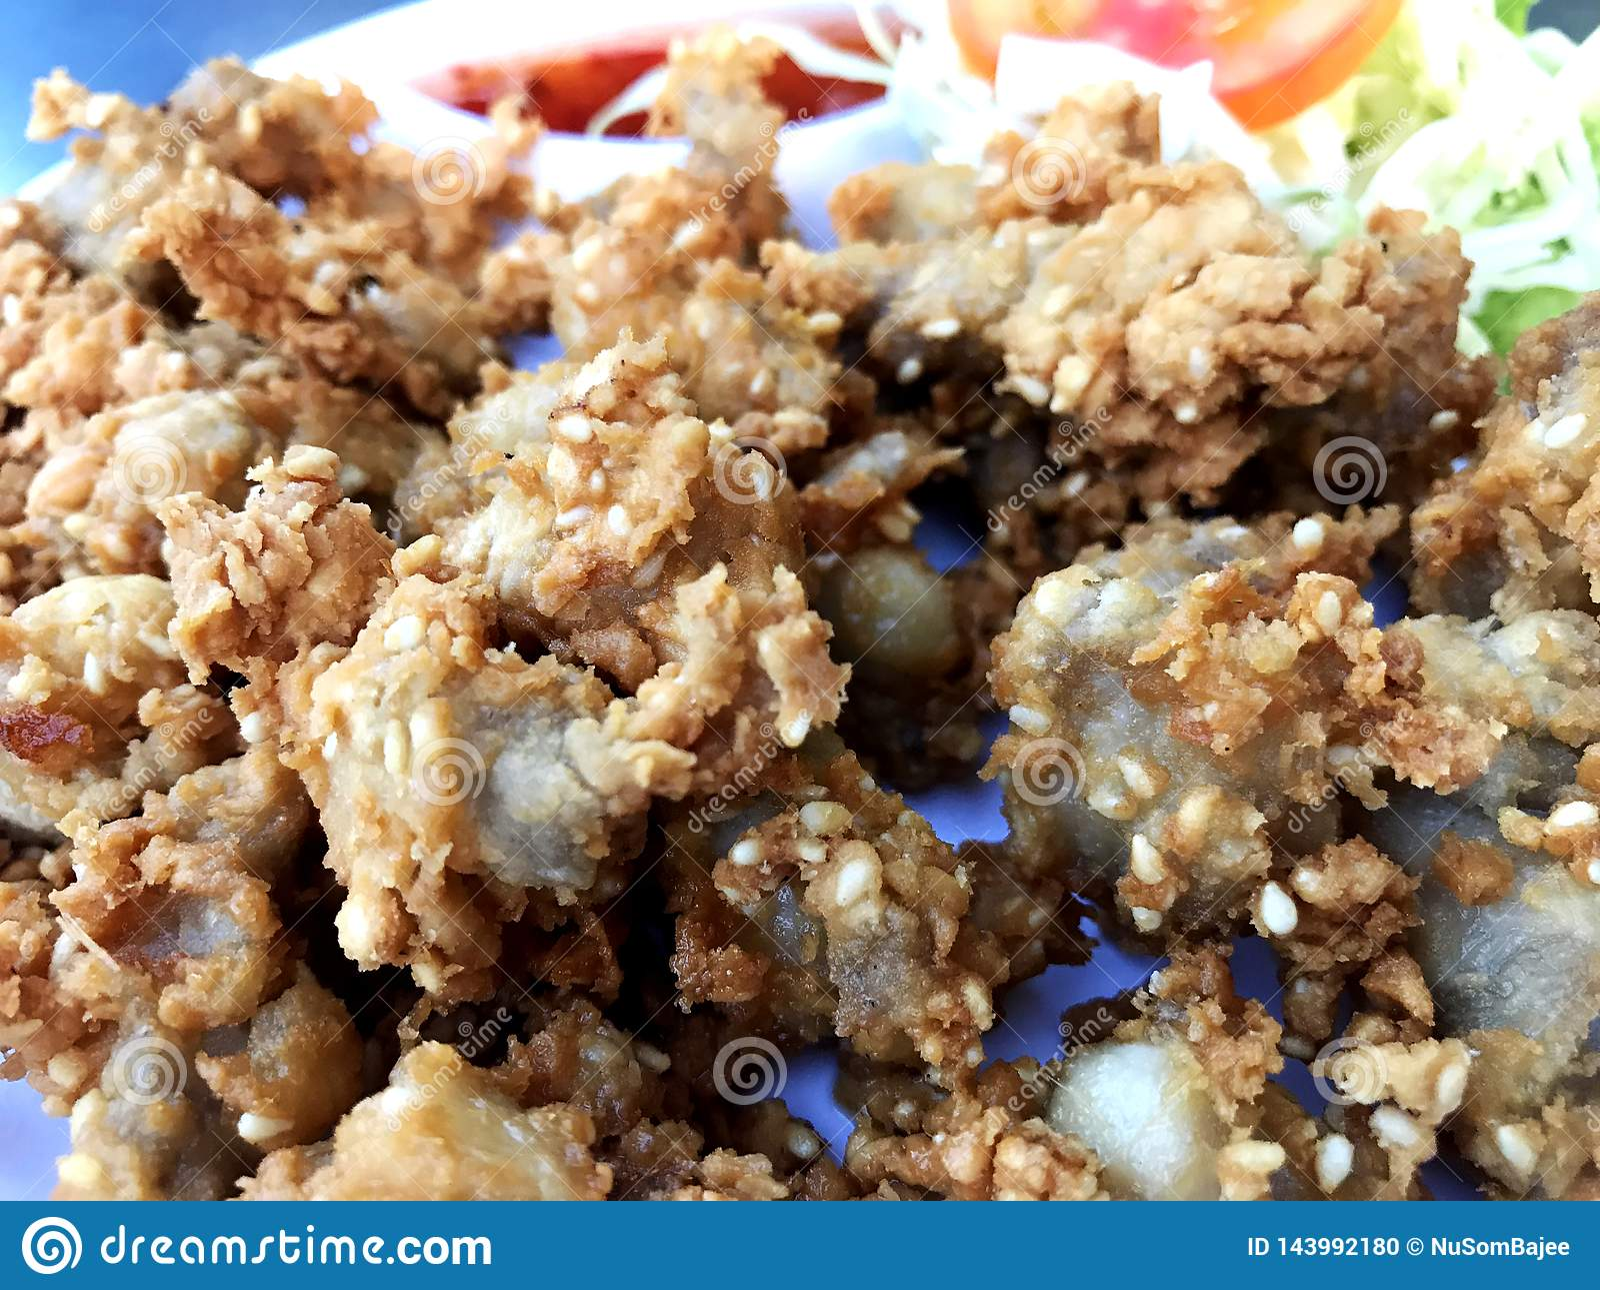 Crispy chicken tendon deep fried food